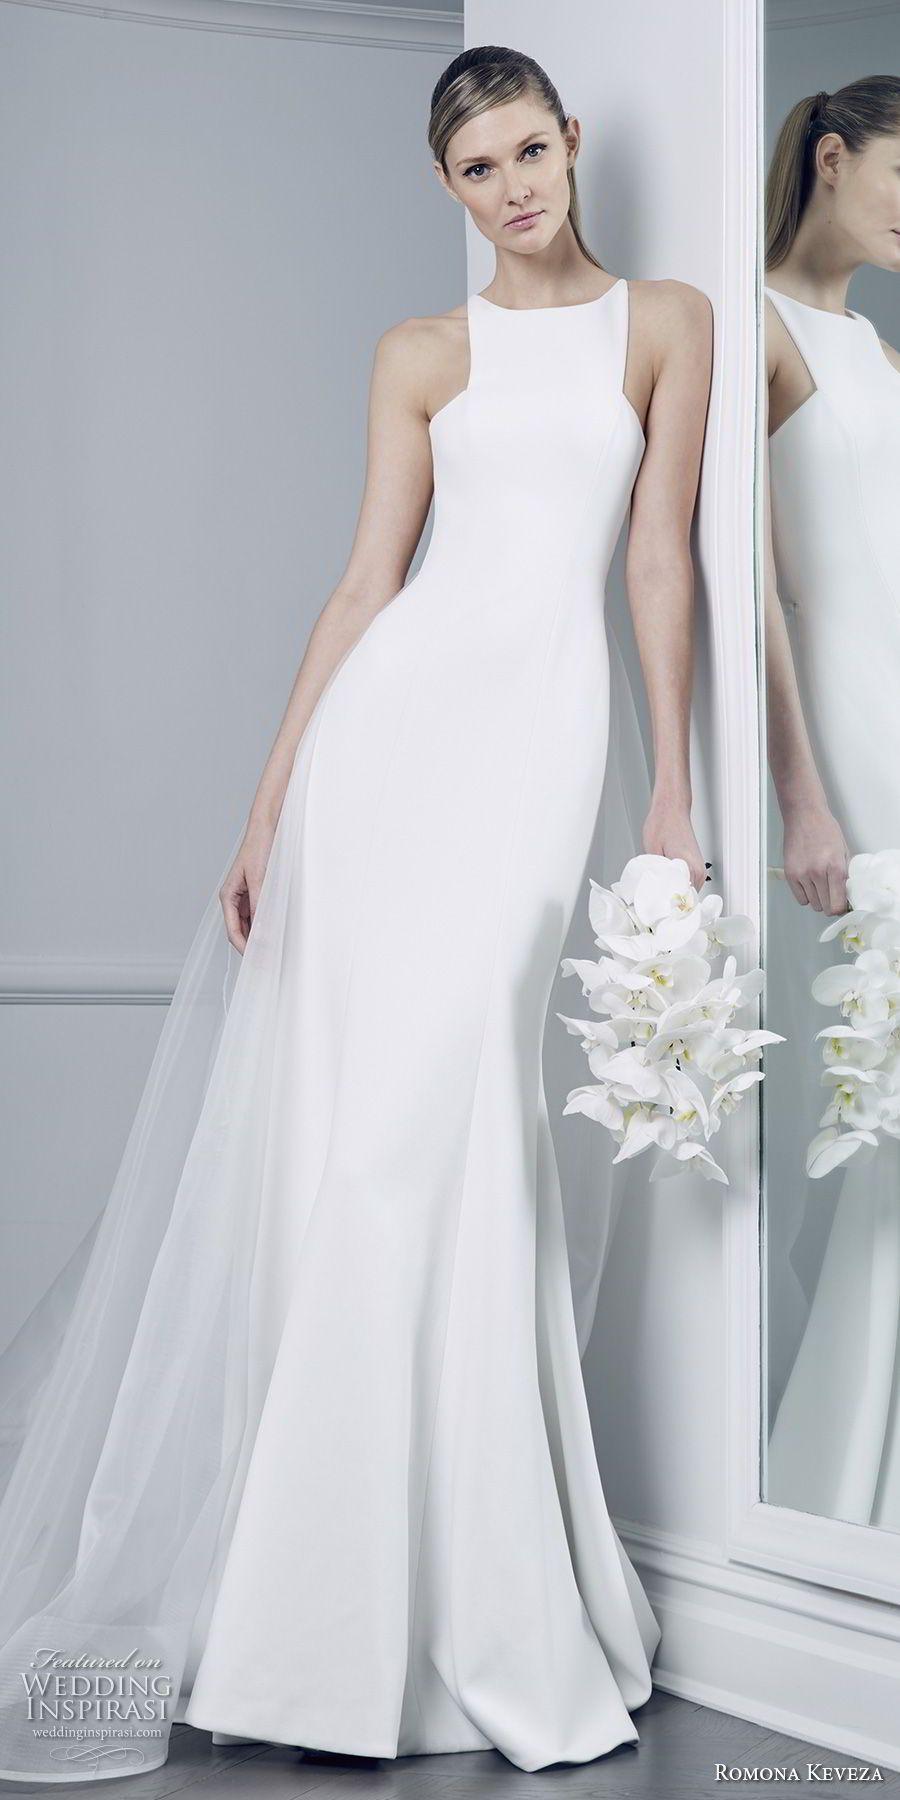 Romona Keveza Collection Bridal Fall 2018 Wedding Dresses ...